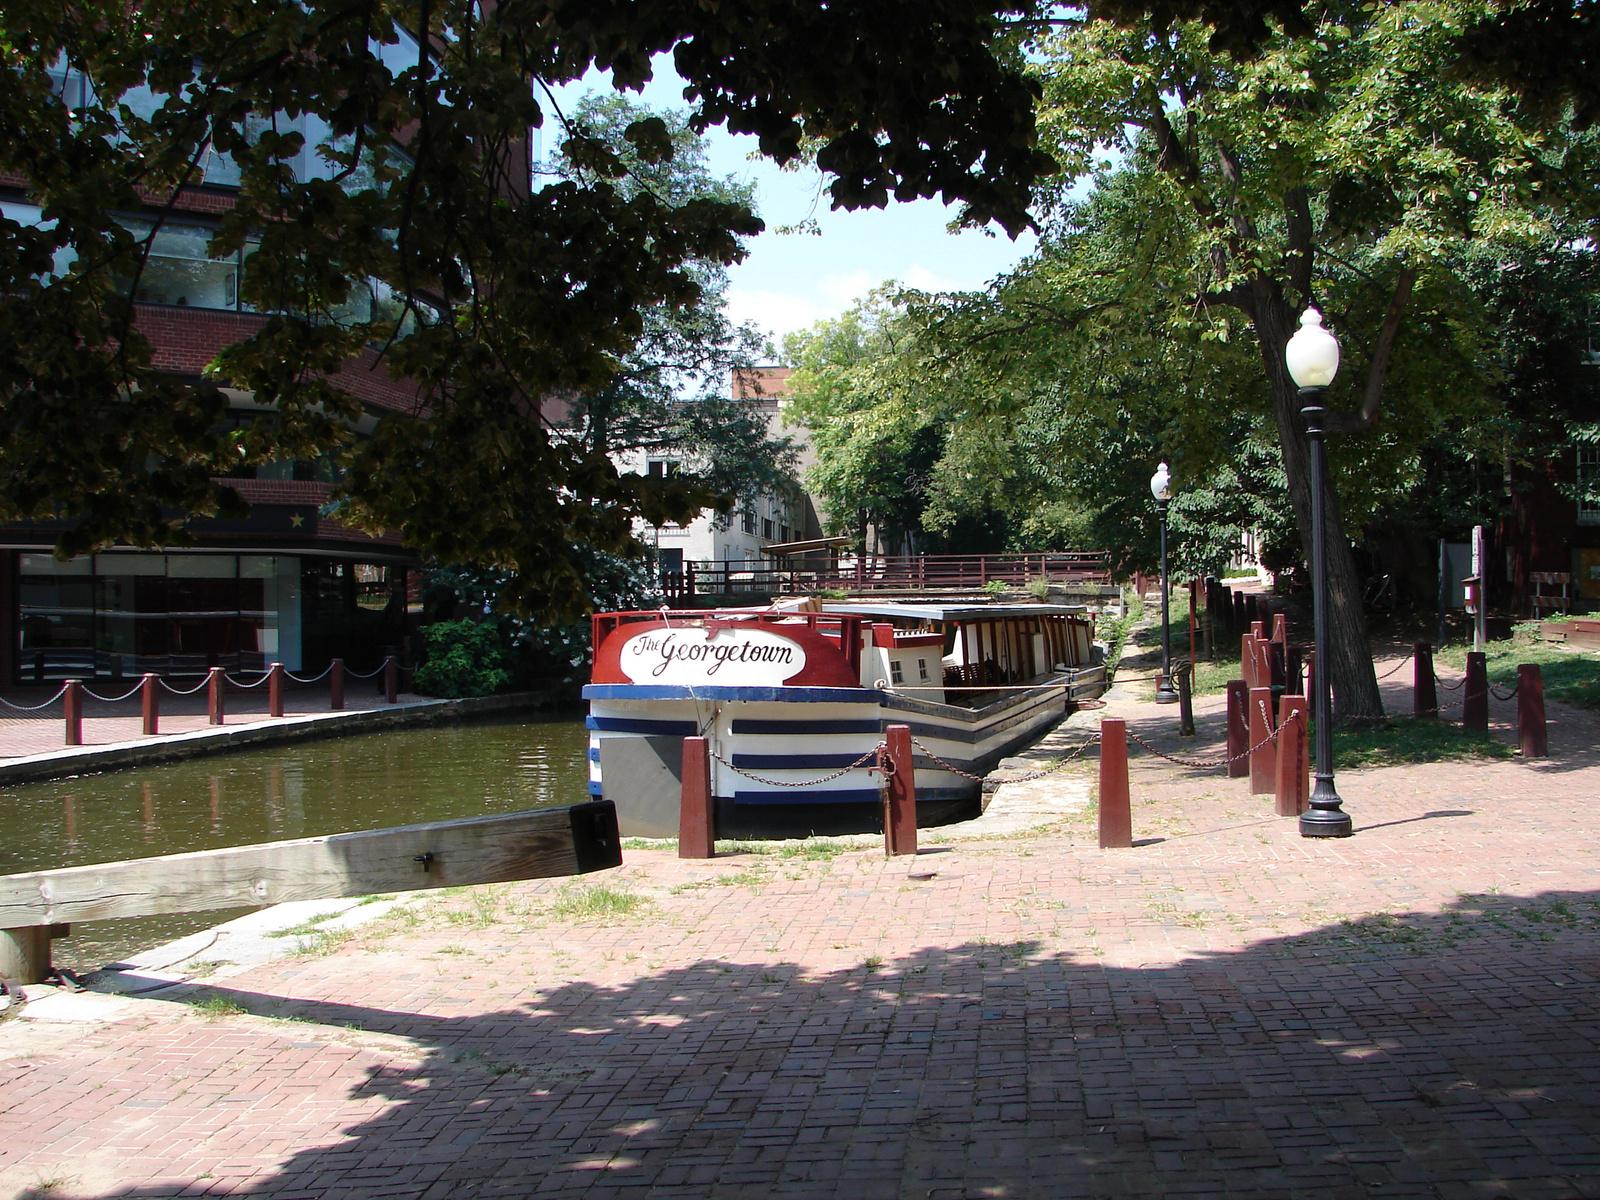 Washington Georgetown boat